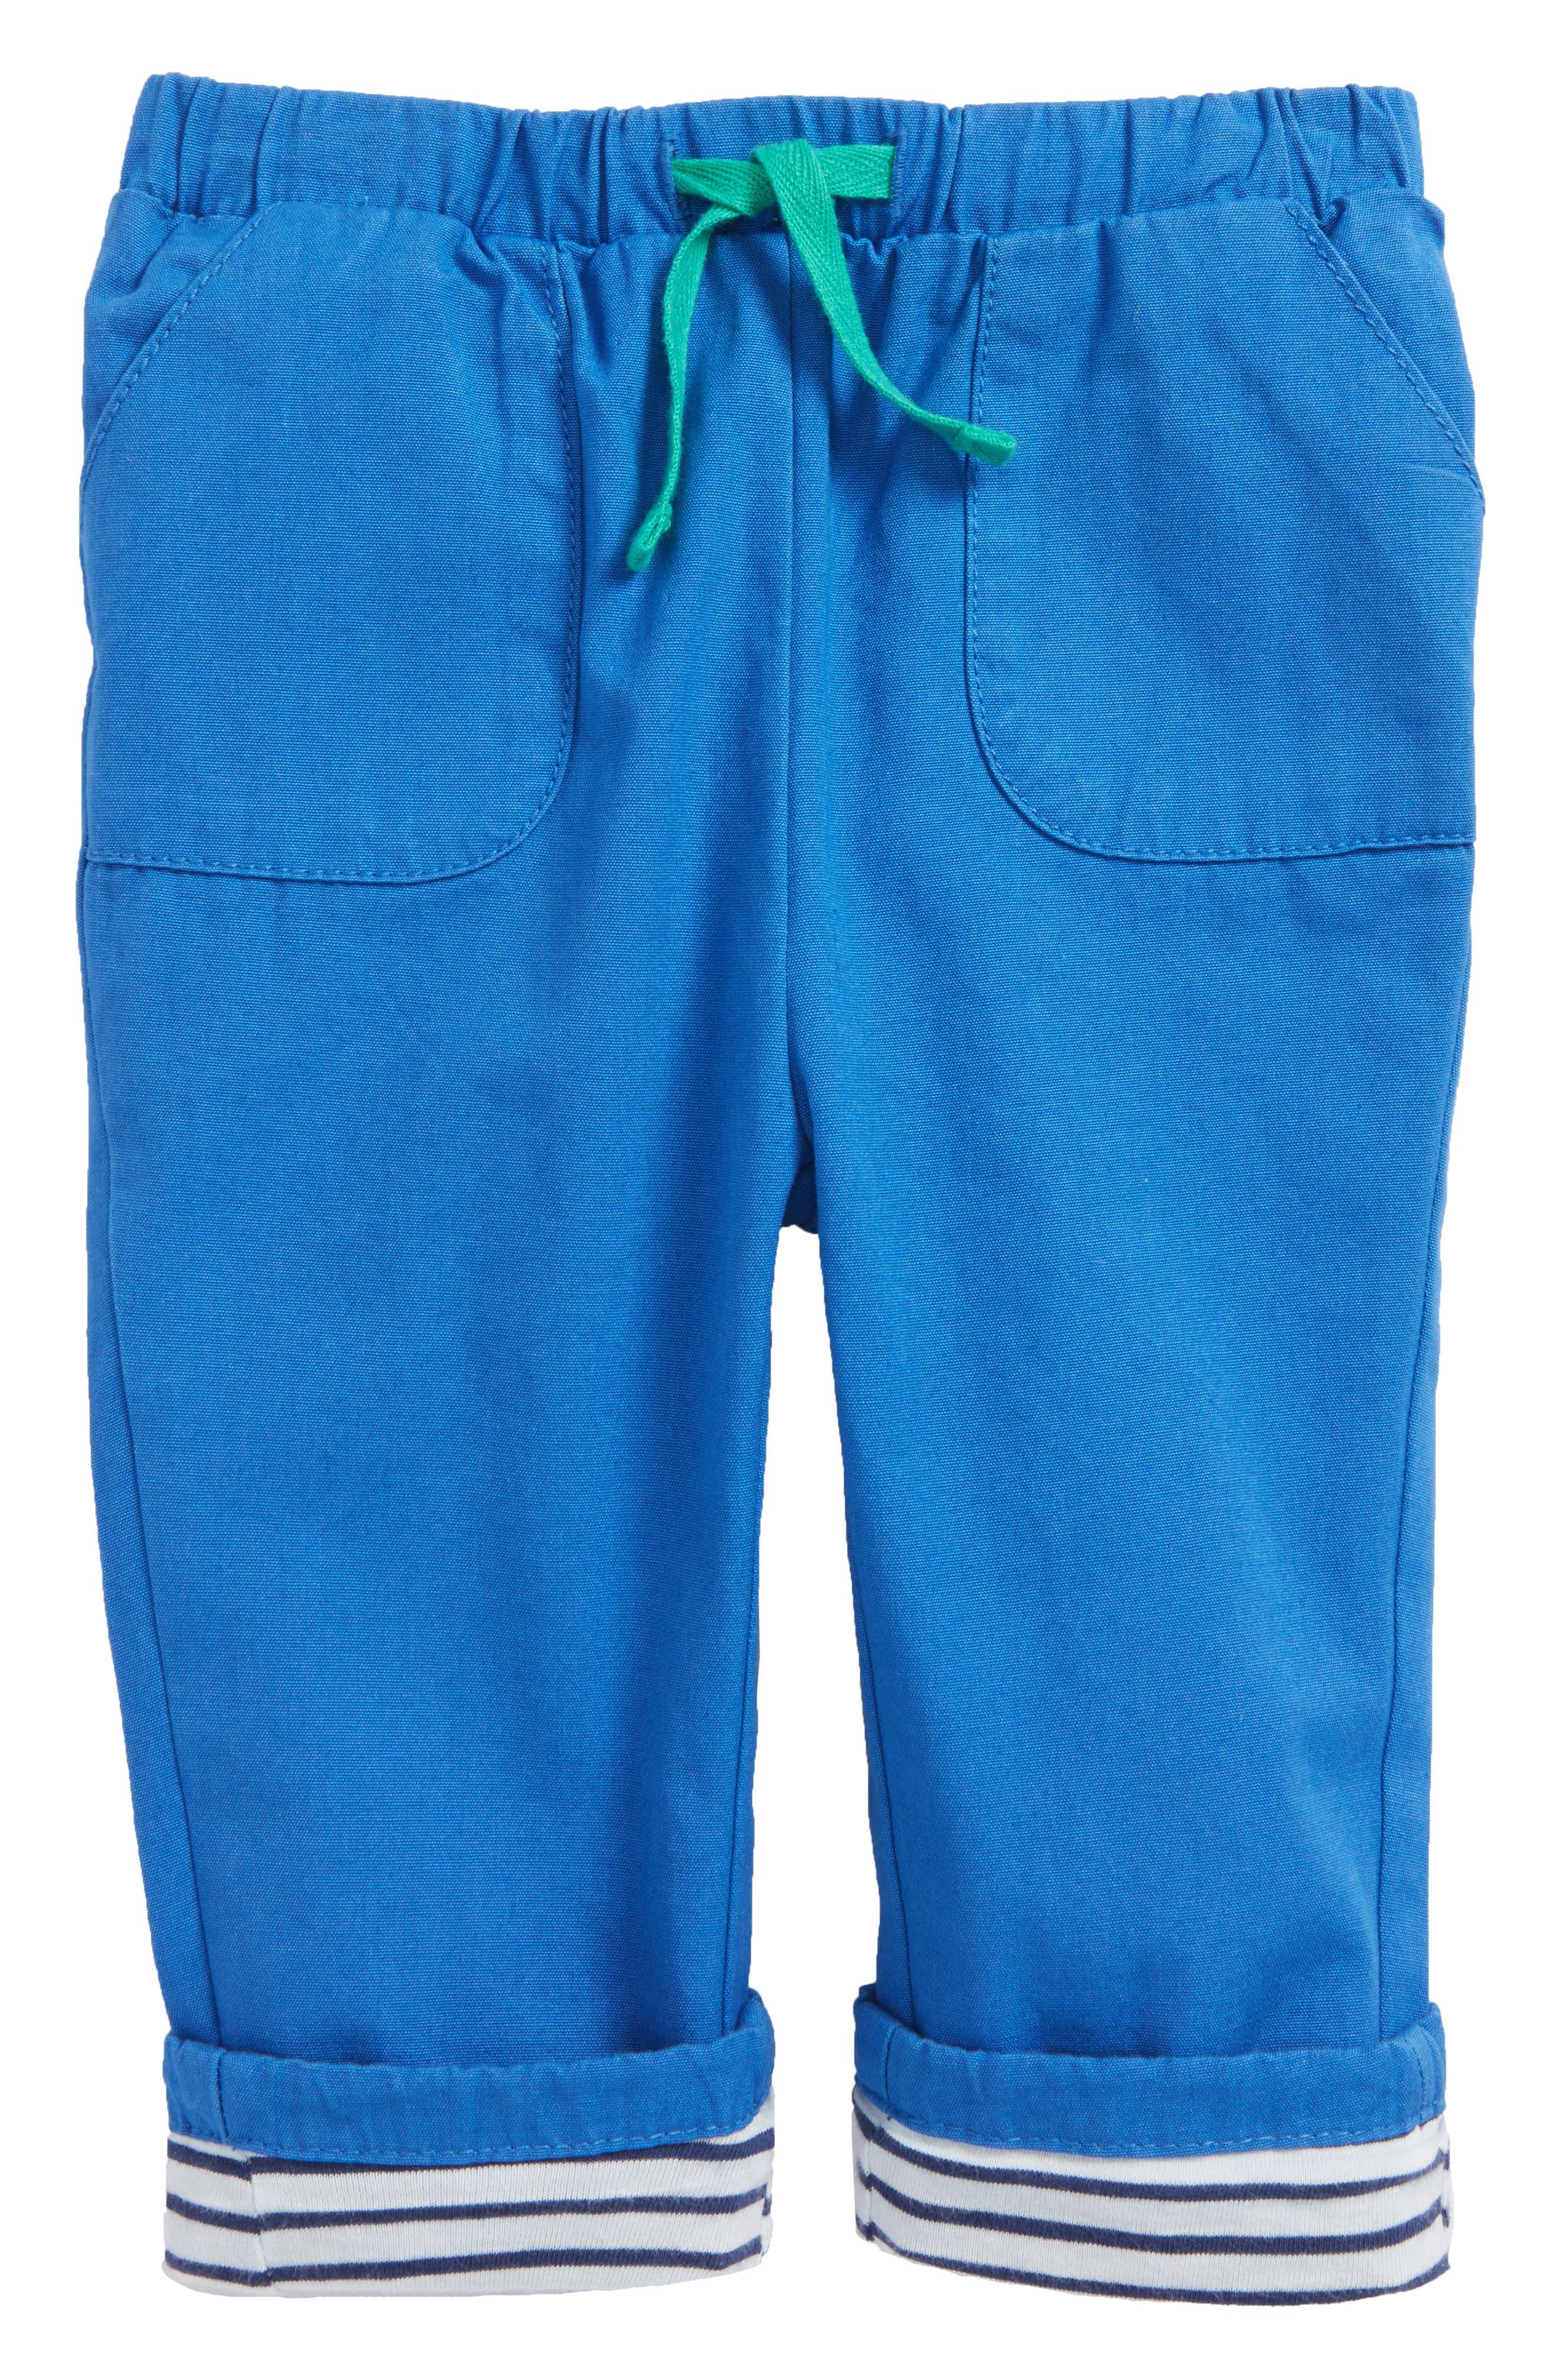 Pull On Pants,                         Main,                         color, Skipper Blue